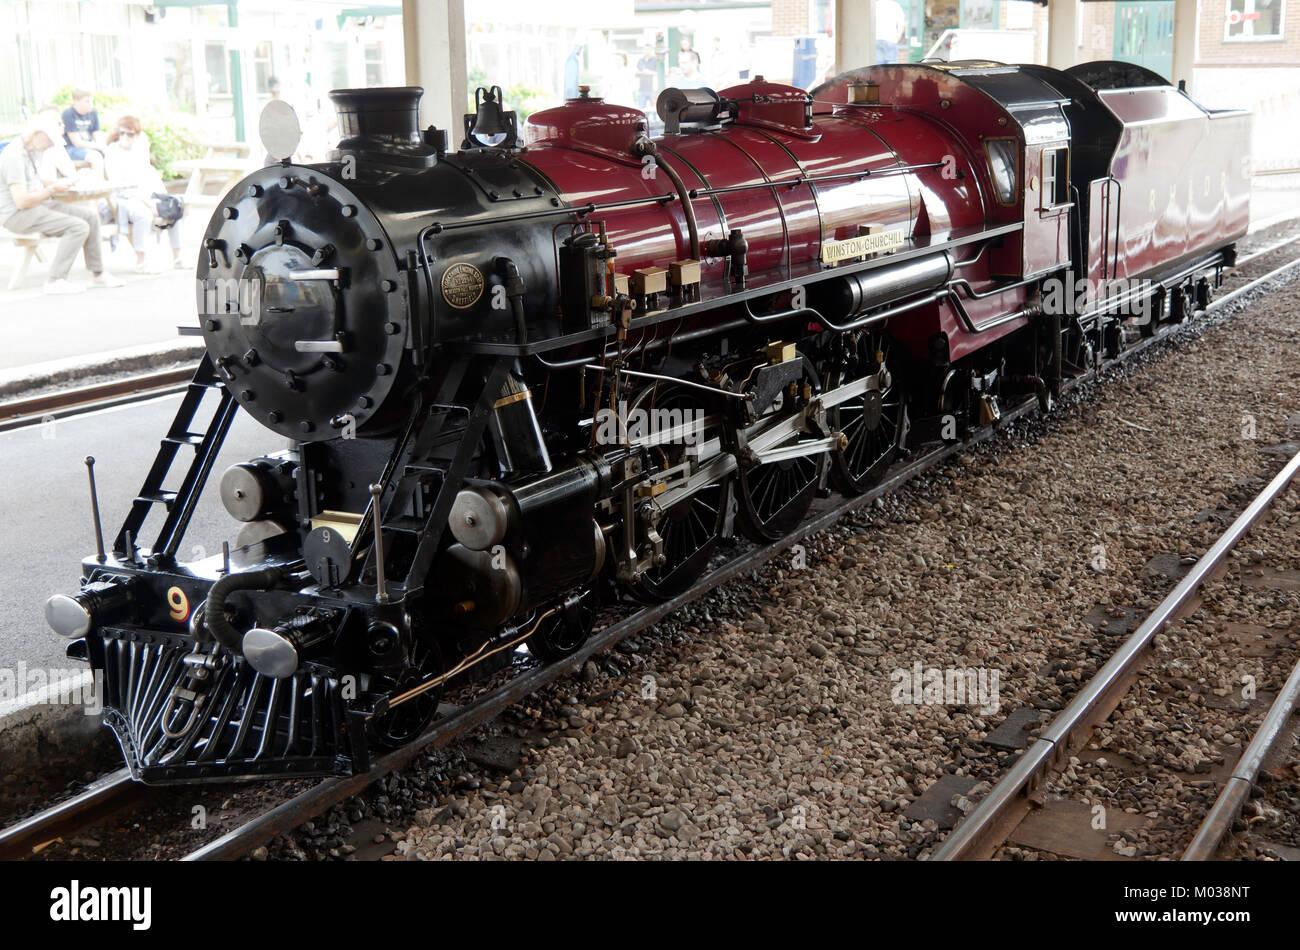 The Steam Locomotive (Engine No.9 ),  Winston Churchill, at New Romney Station, RH&D Railway, Kent Stock Photo